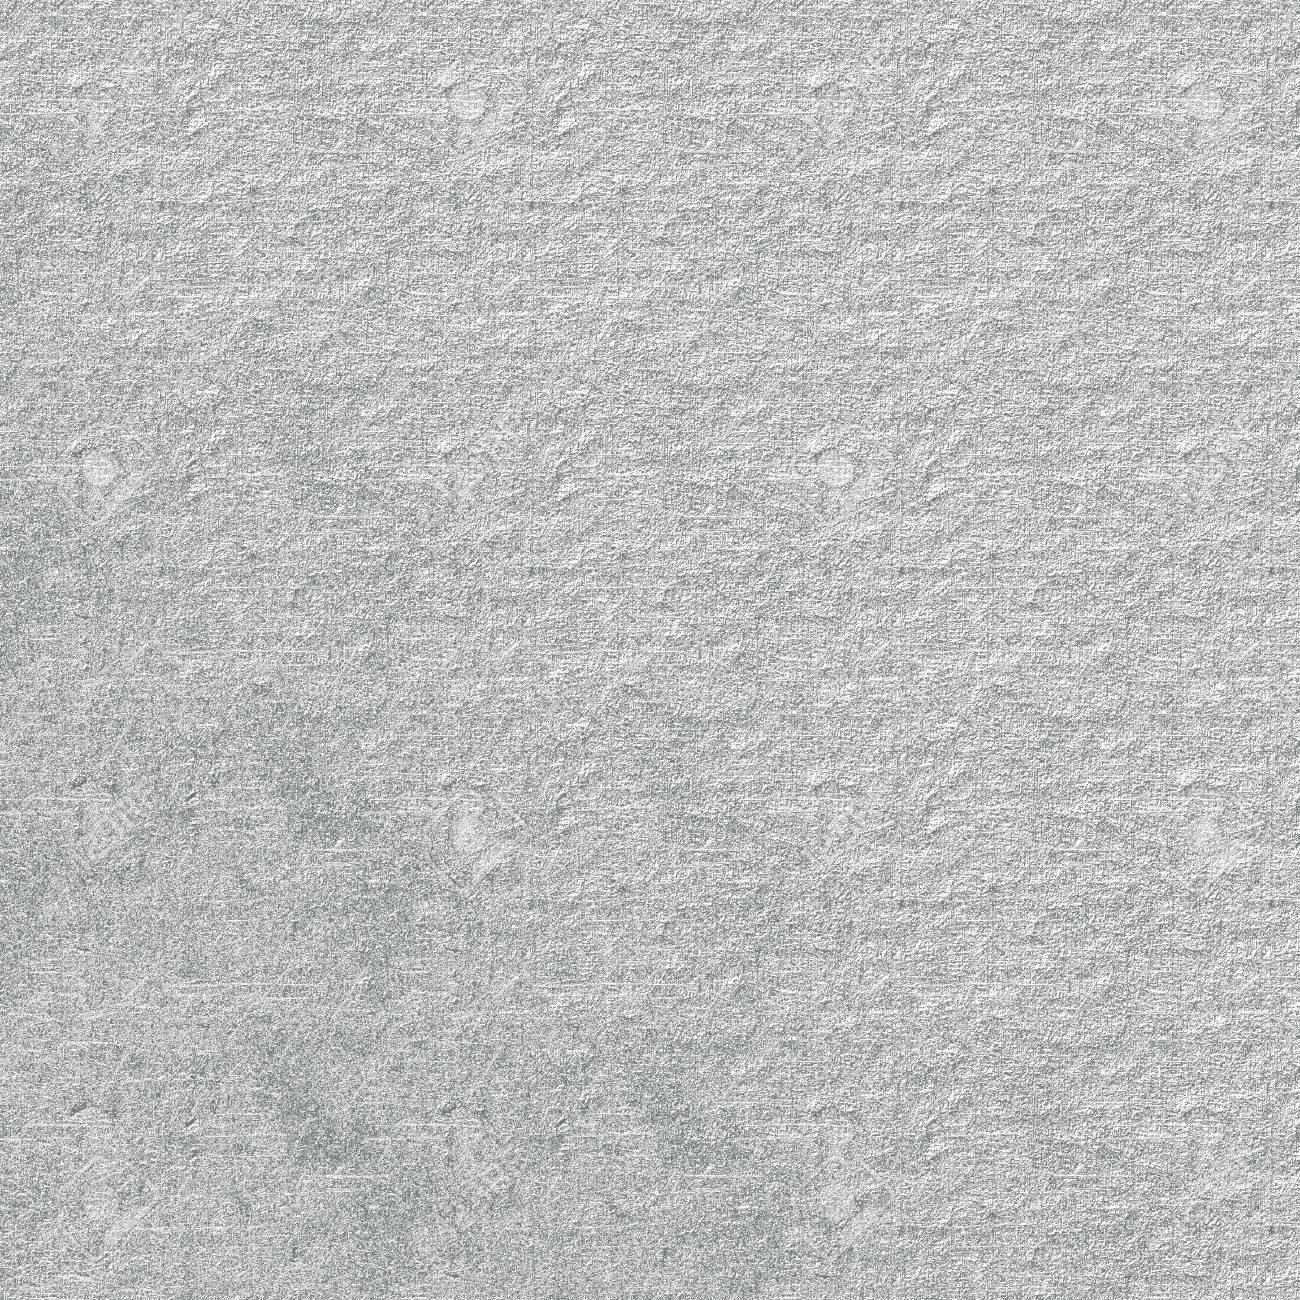 Silber Folie Glanzend Metall Textur Hintergrund Papier Papier Fur